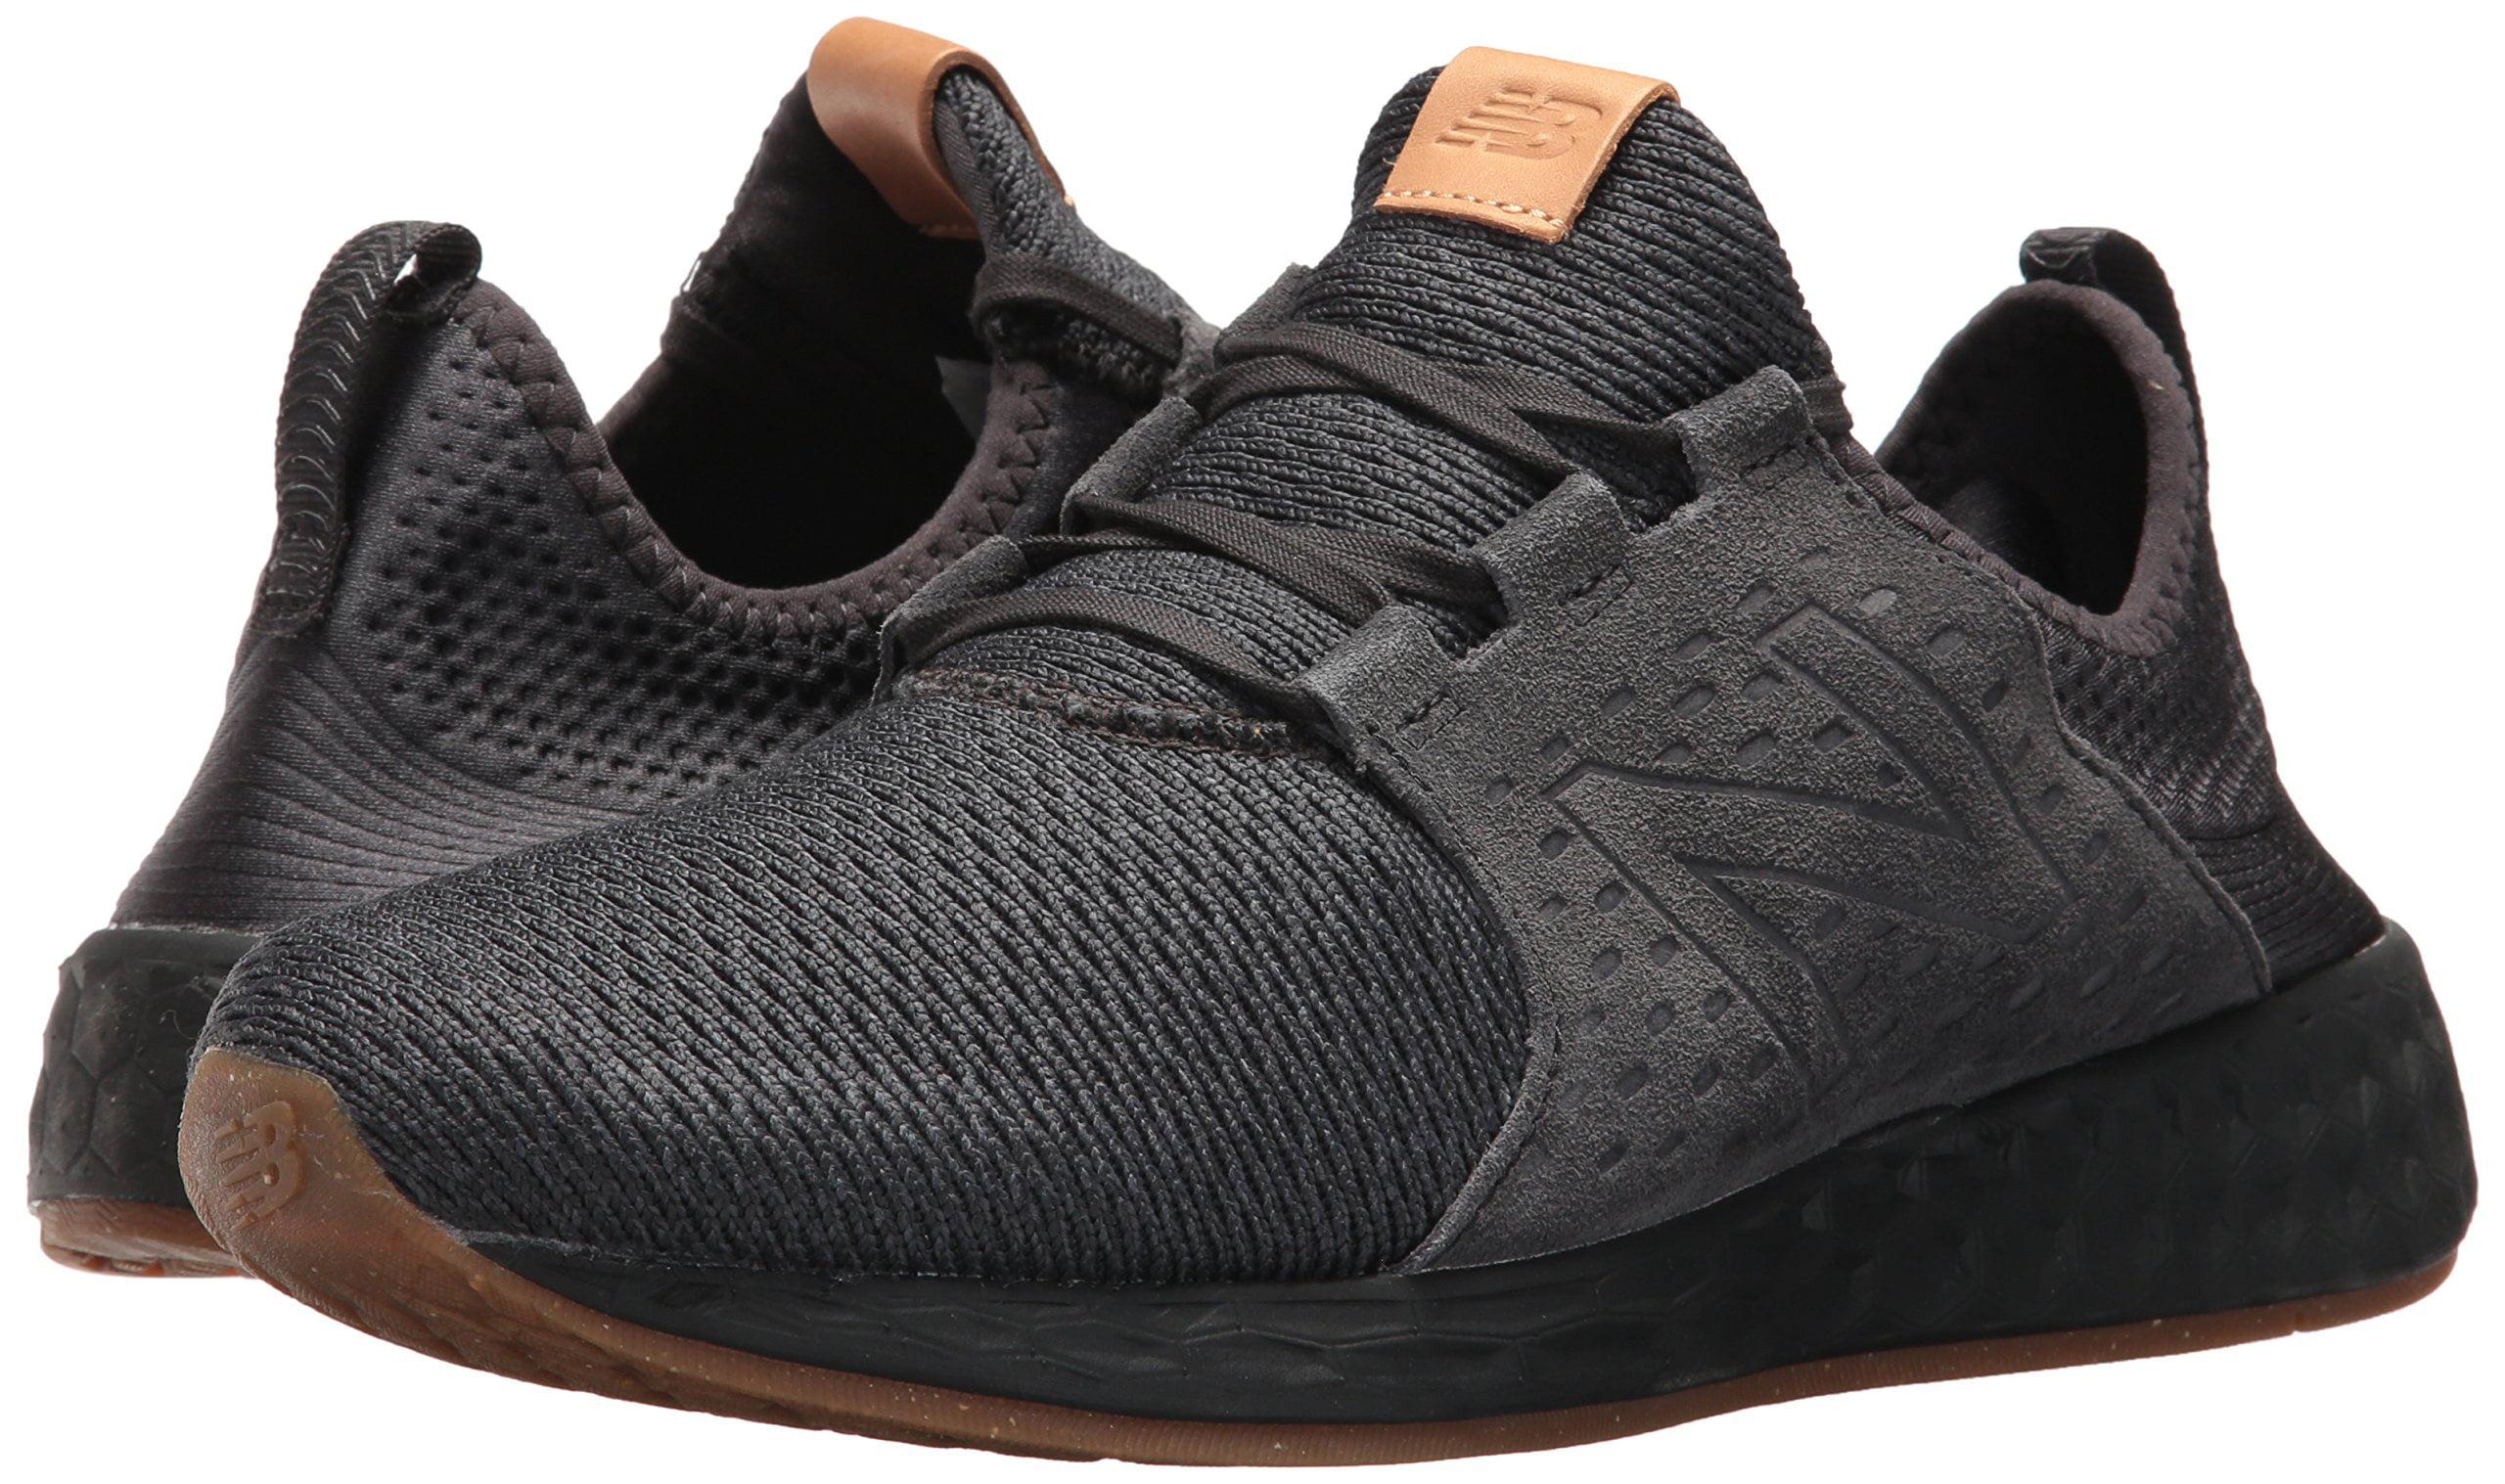 MCRUZOP 6T Mens New Balance FRESH FOAM CRUZ RUNNING Shoes